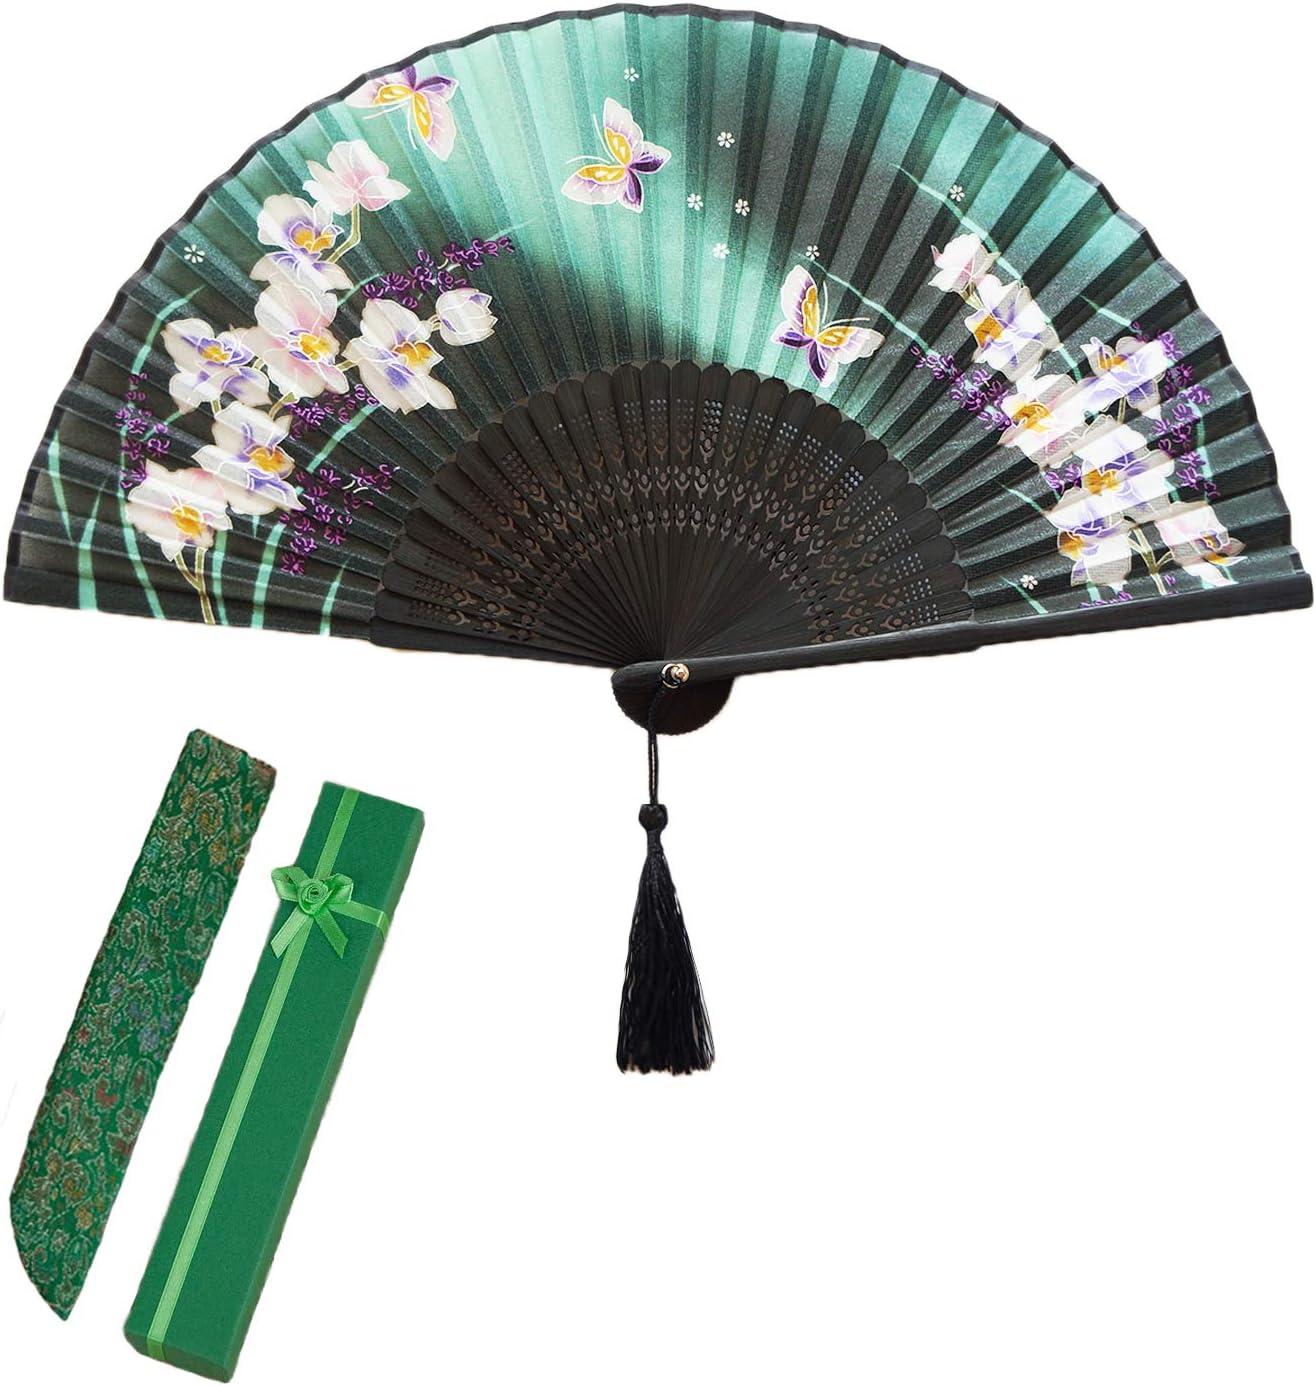 Marco de bamb/ú FtingSun Abanico Plegable de Mano con dise/ño de Seda Estilo Chino japon/és bailar/ín para Fiestas